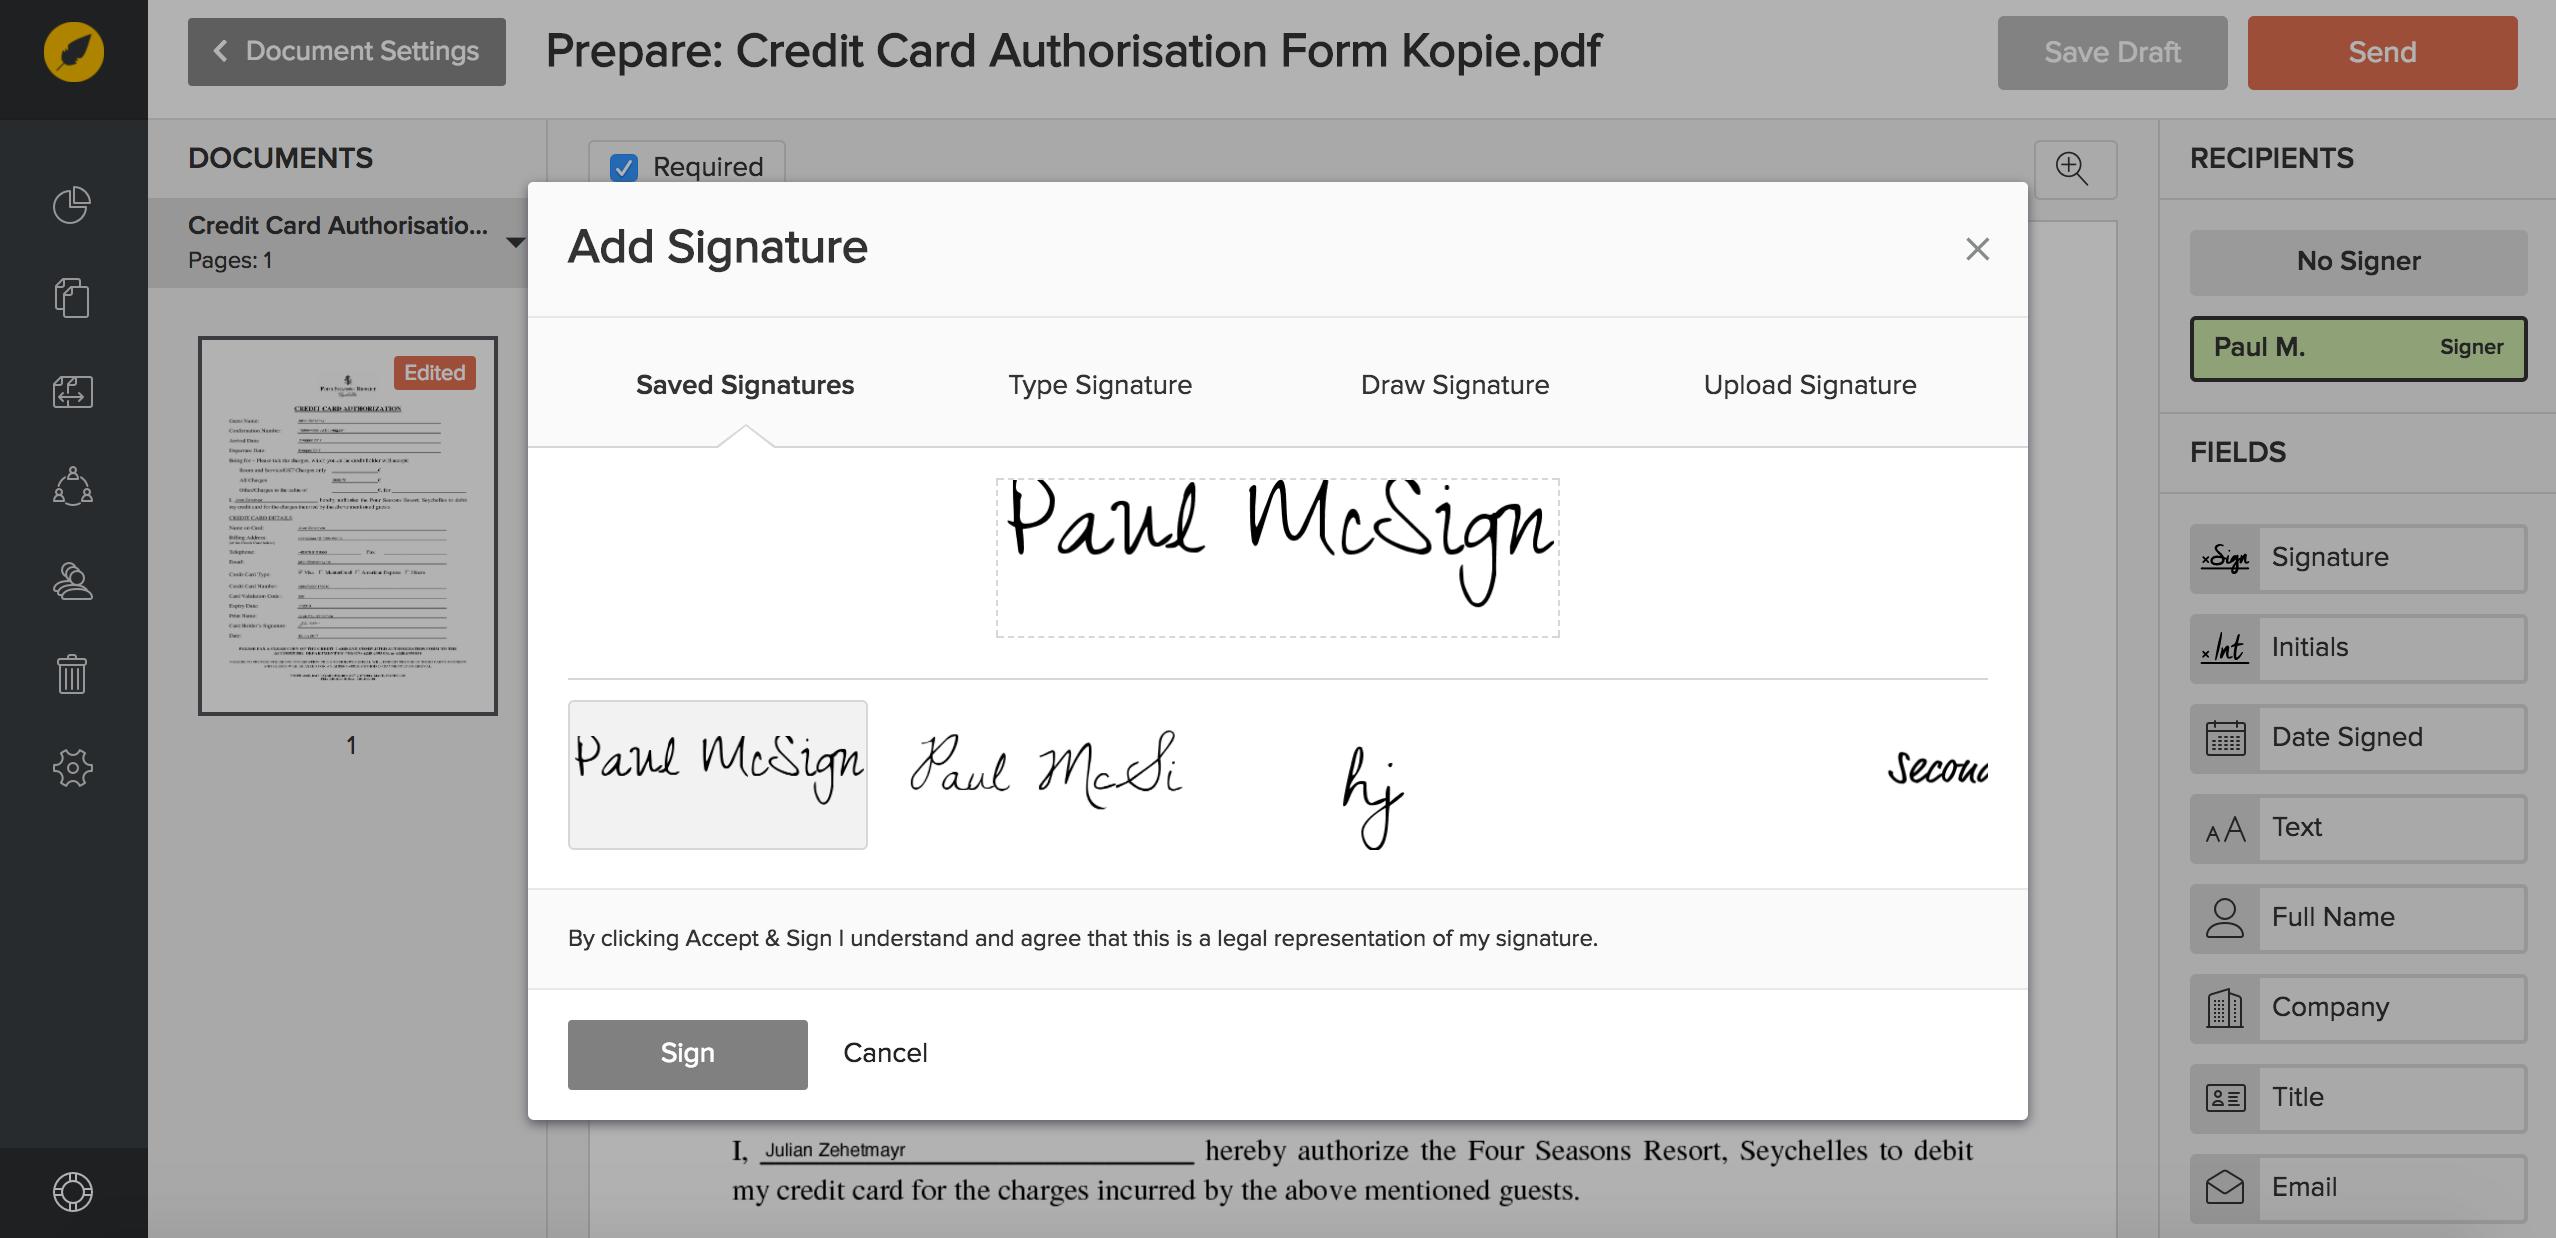 Add signature